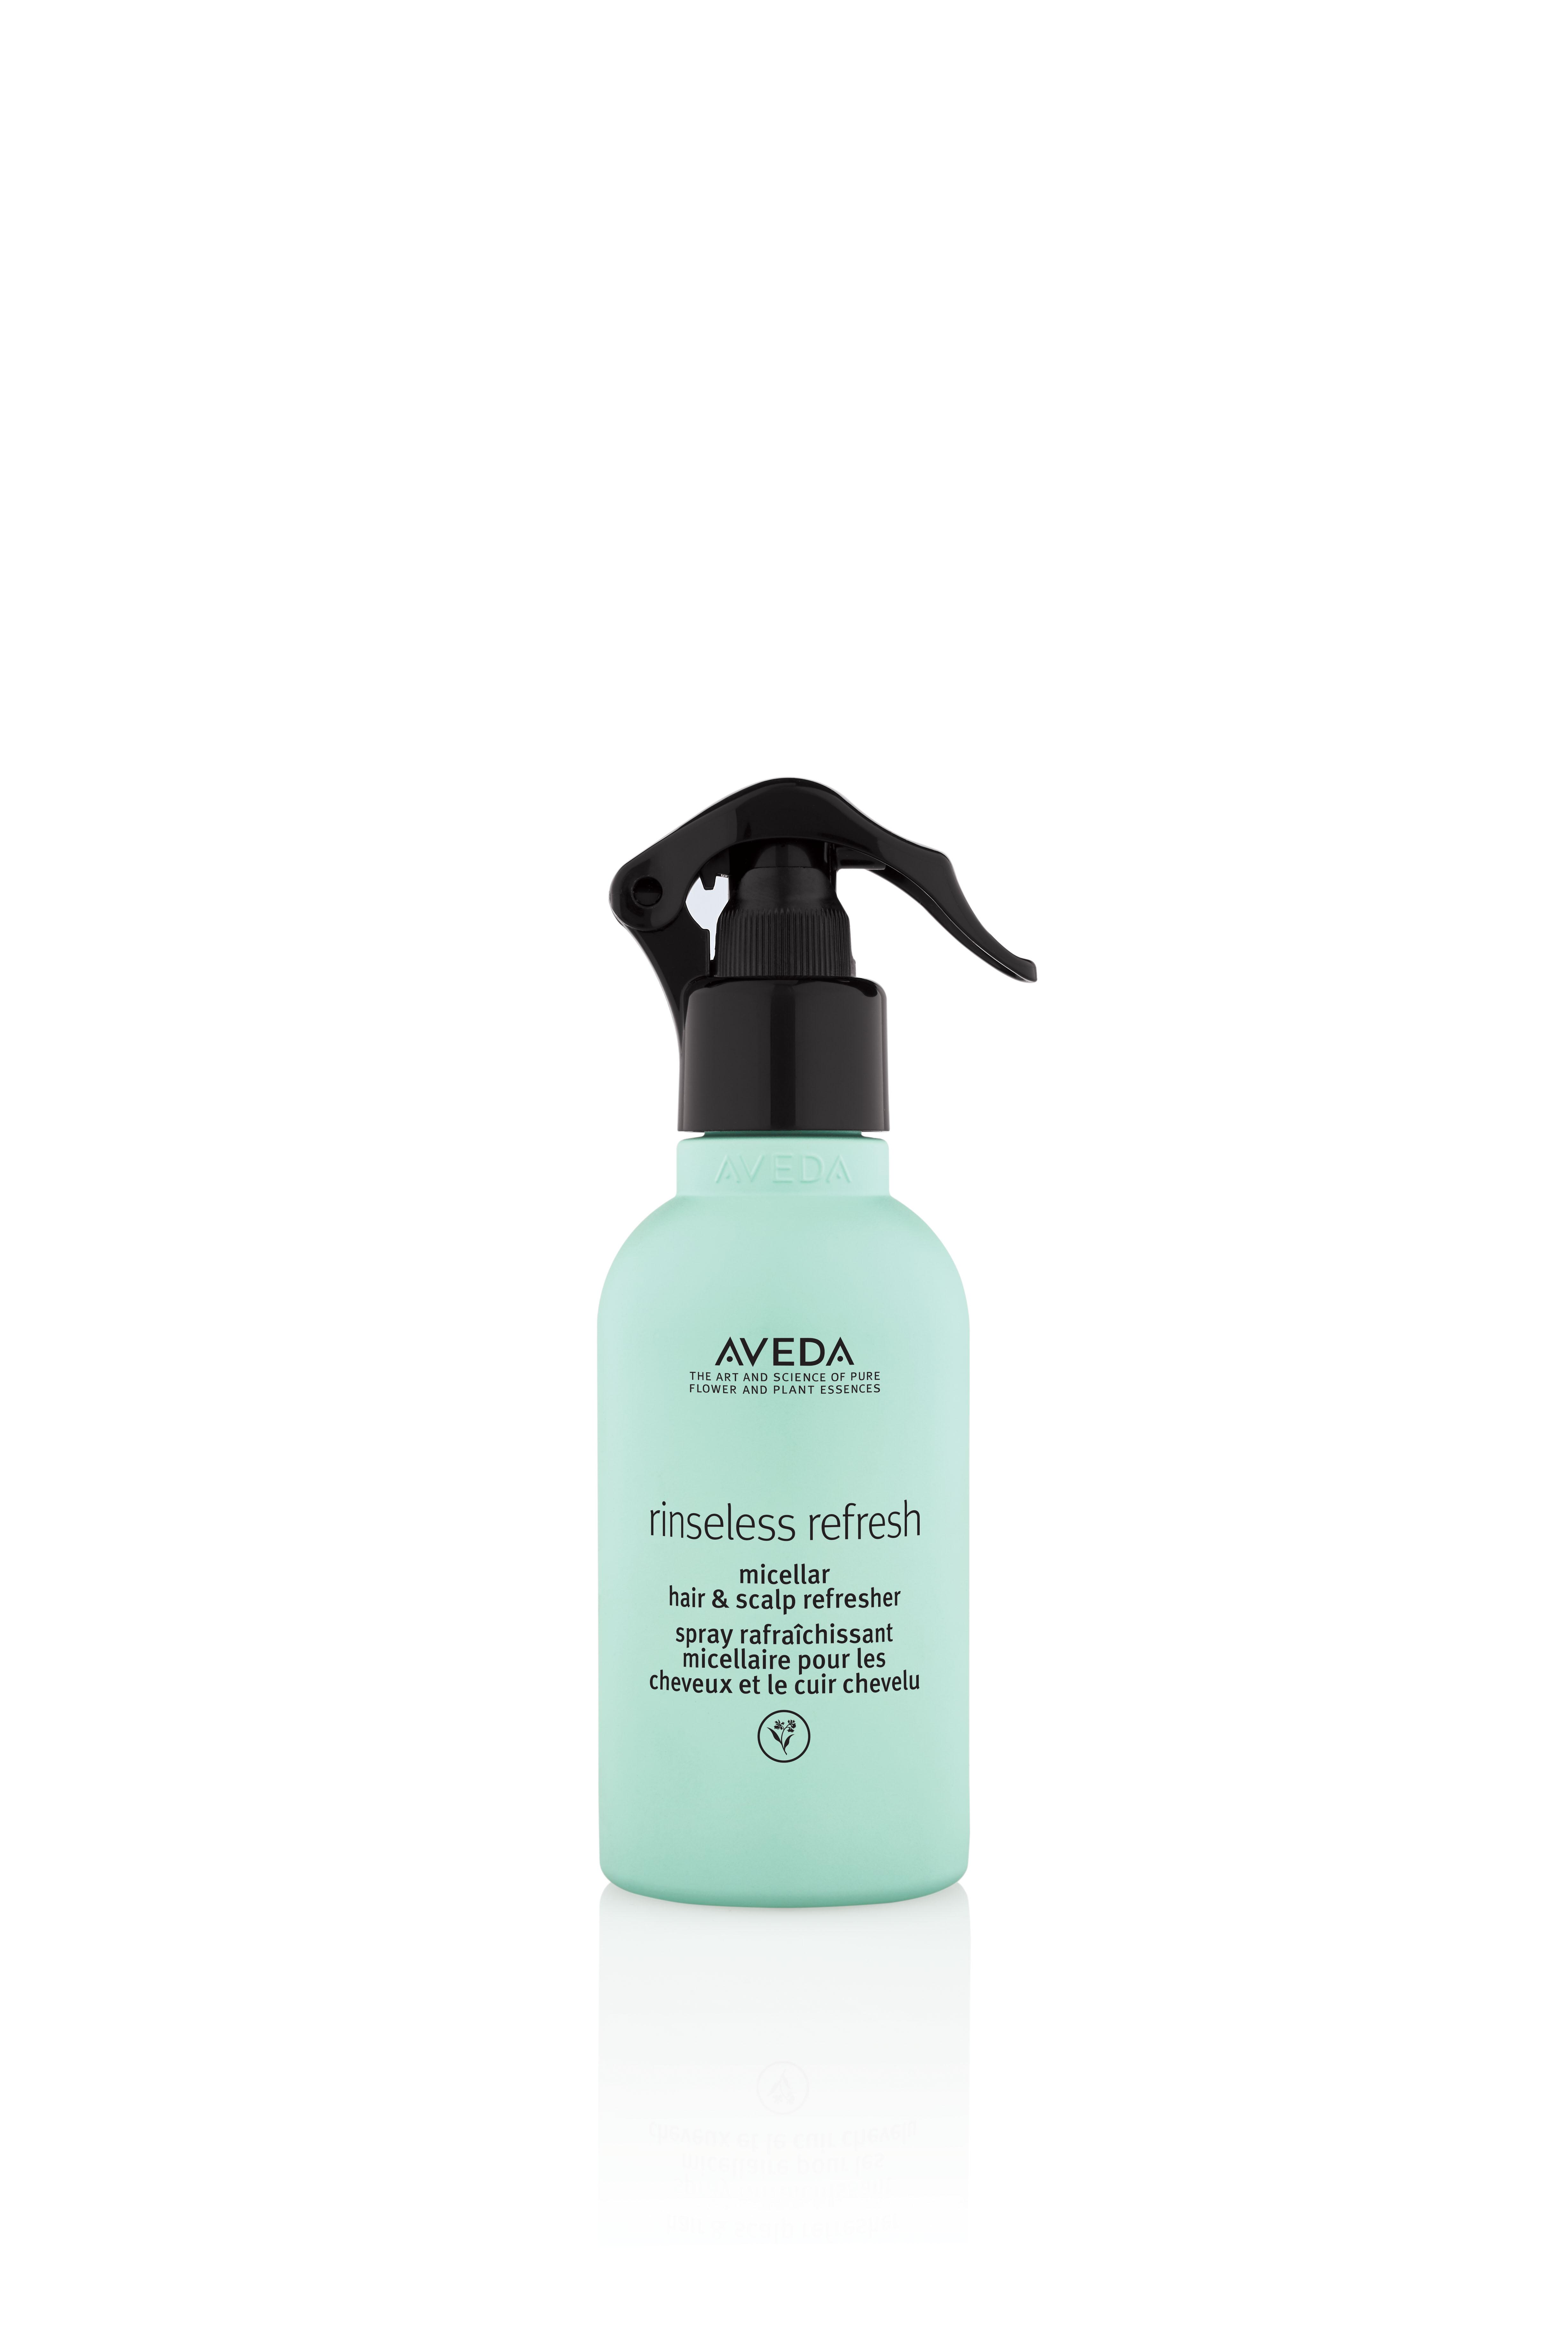 Aveda's New Vegan Rinseless Refresh Micellar Hair and Scalp Refresher